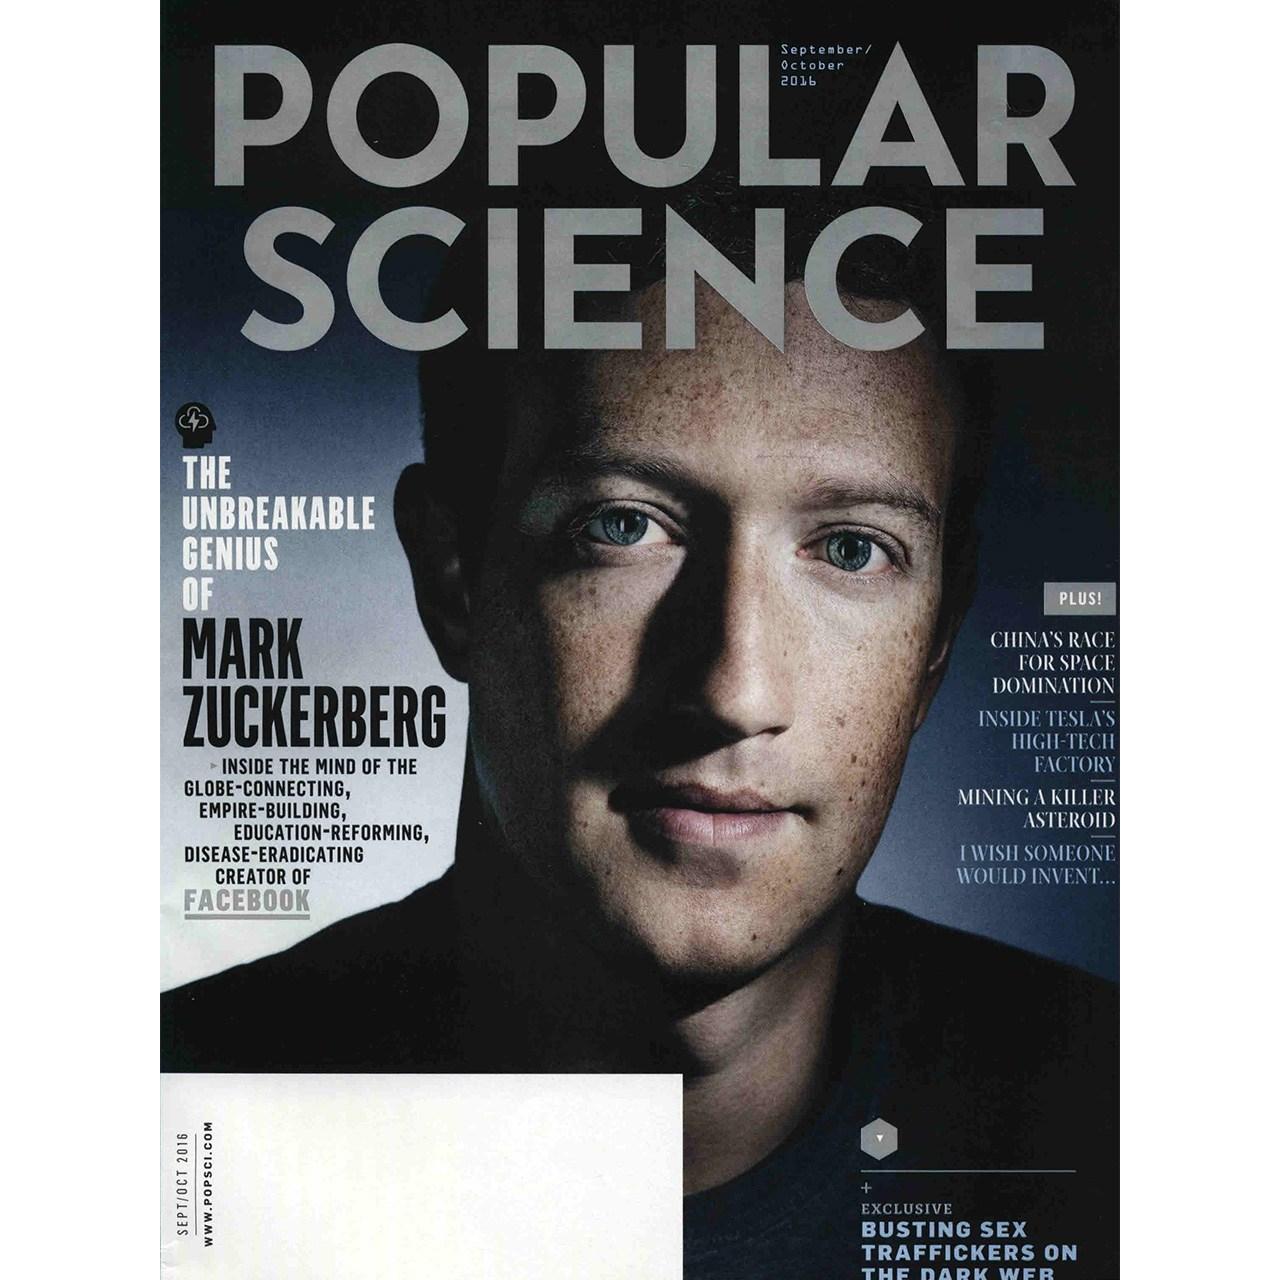 مجله پاپیولار ساینس - سپتامبر/ اکتبر 2016